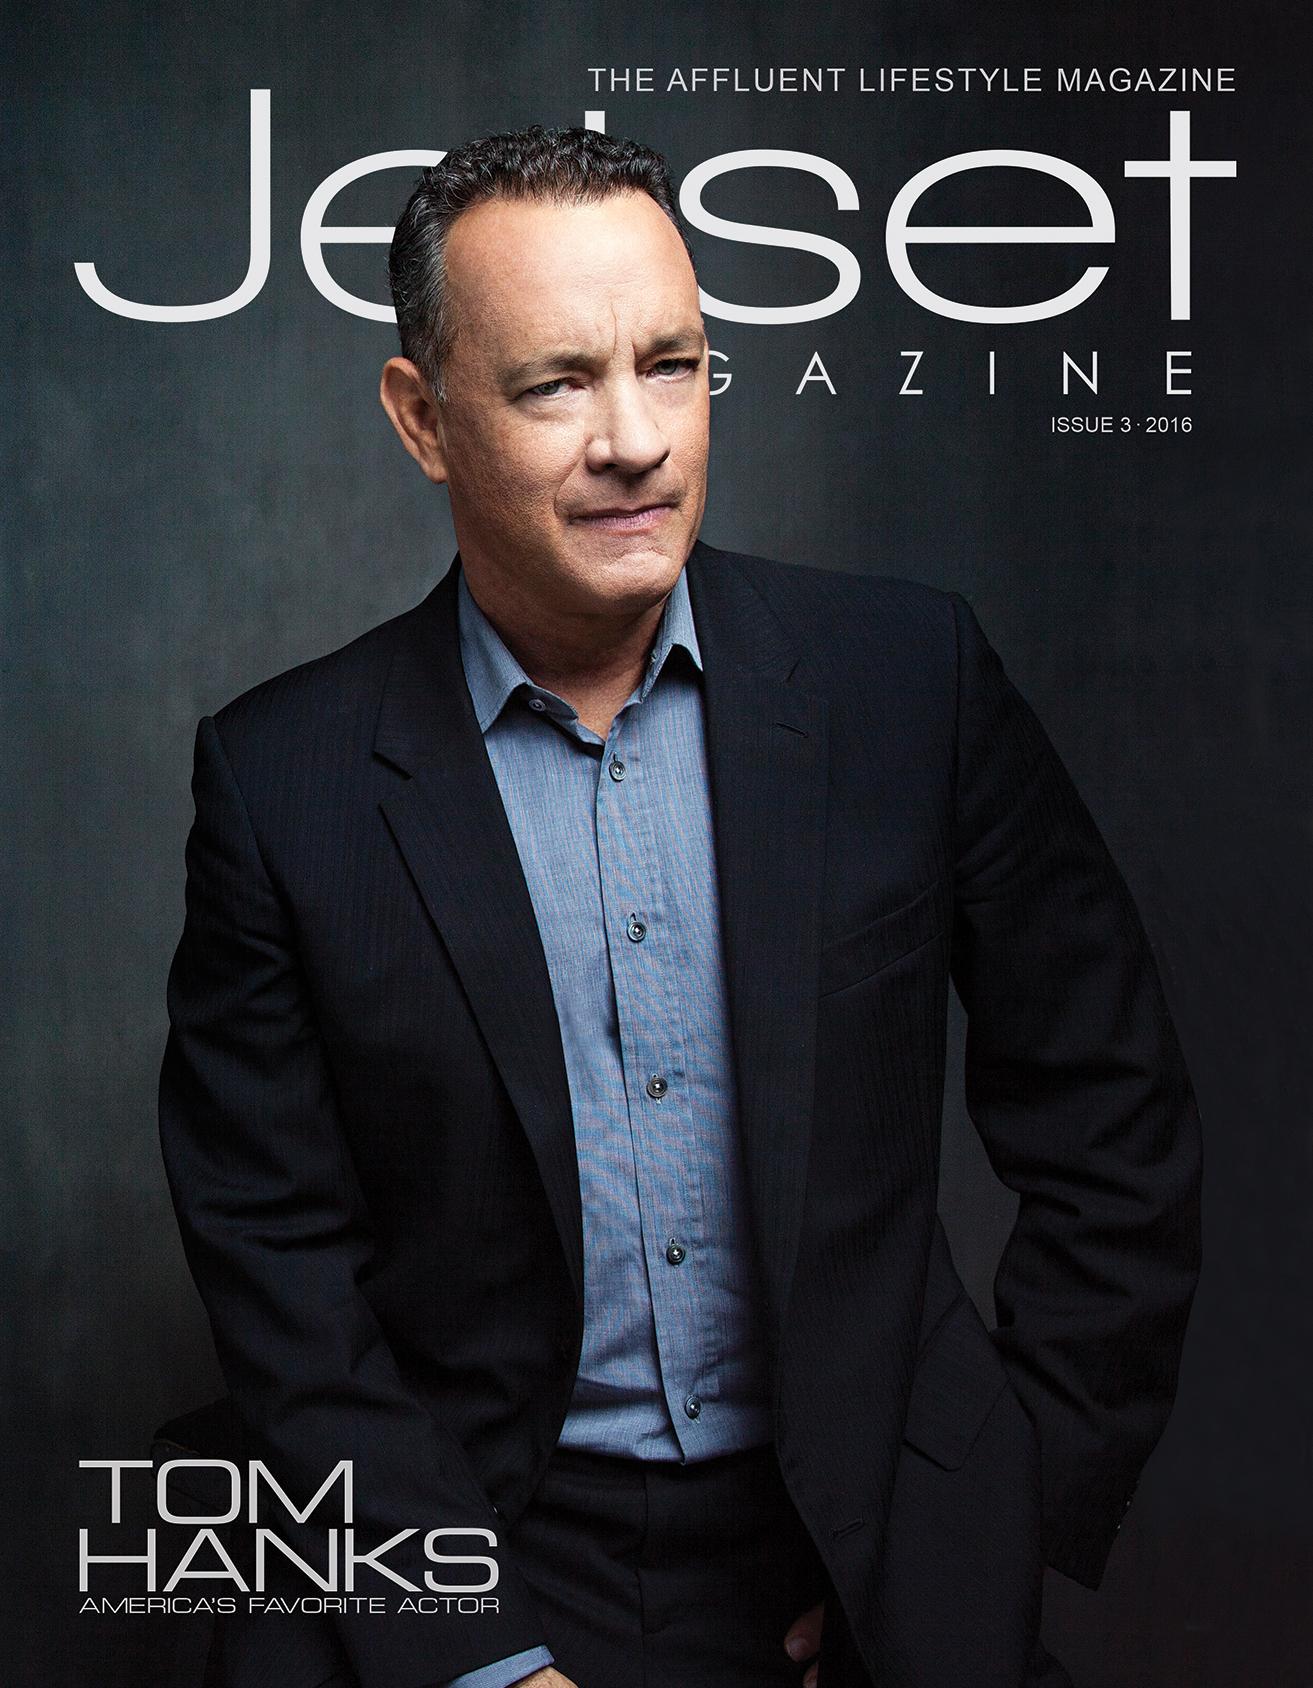 Jetset-Tom Hanks